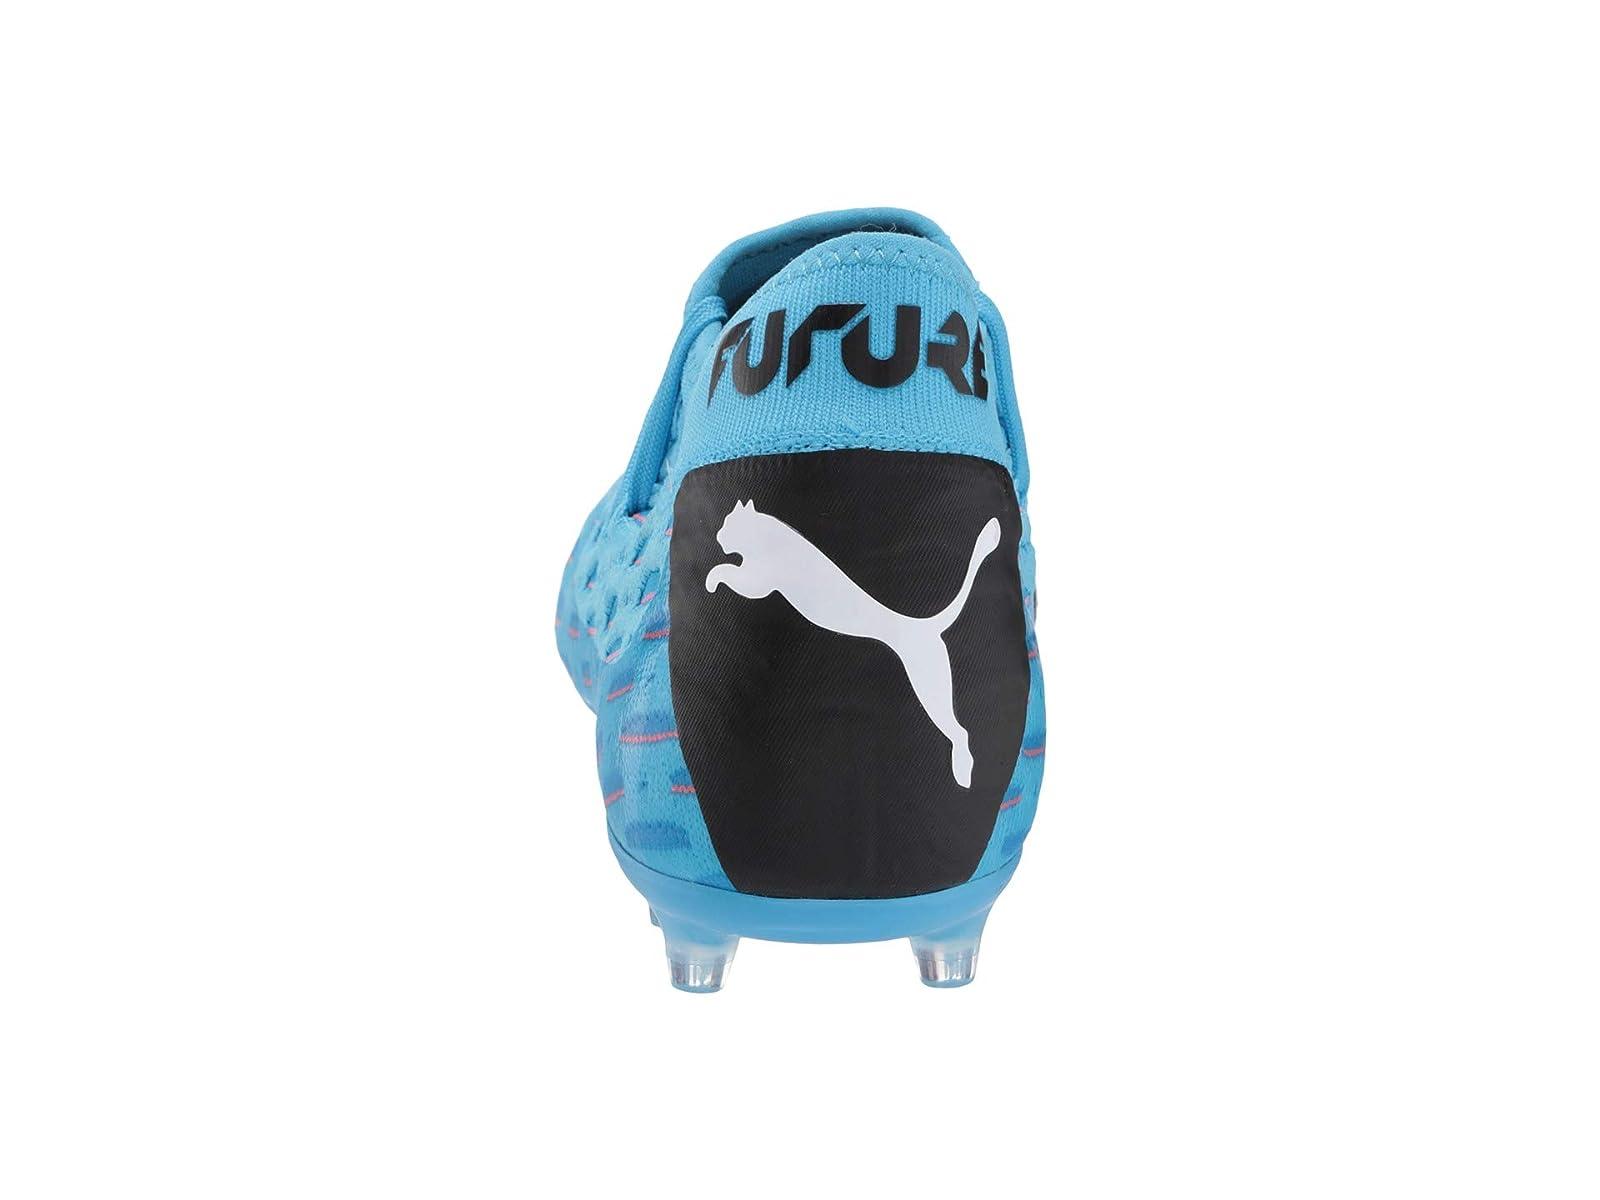 Man-039-s-Sneakers-amp-Athletic-Shoes-PUMA-Future-5-2-Netfit-FG-AG thumbnail 6